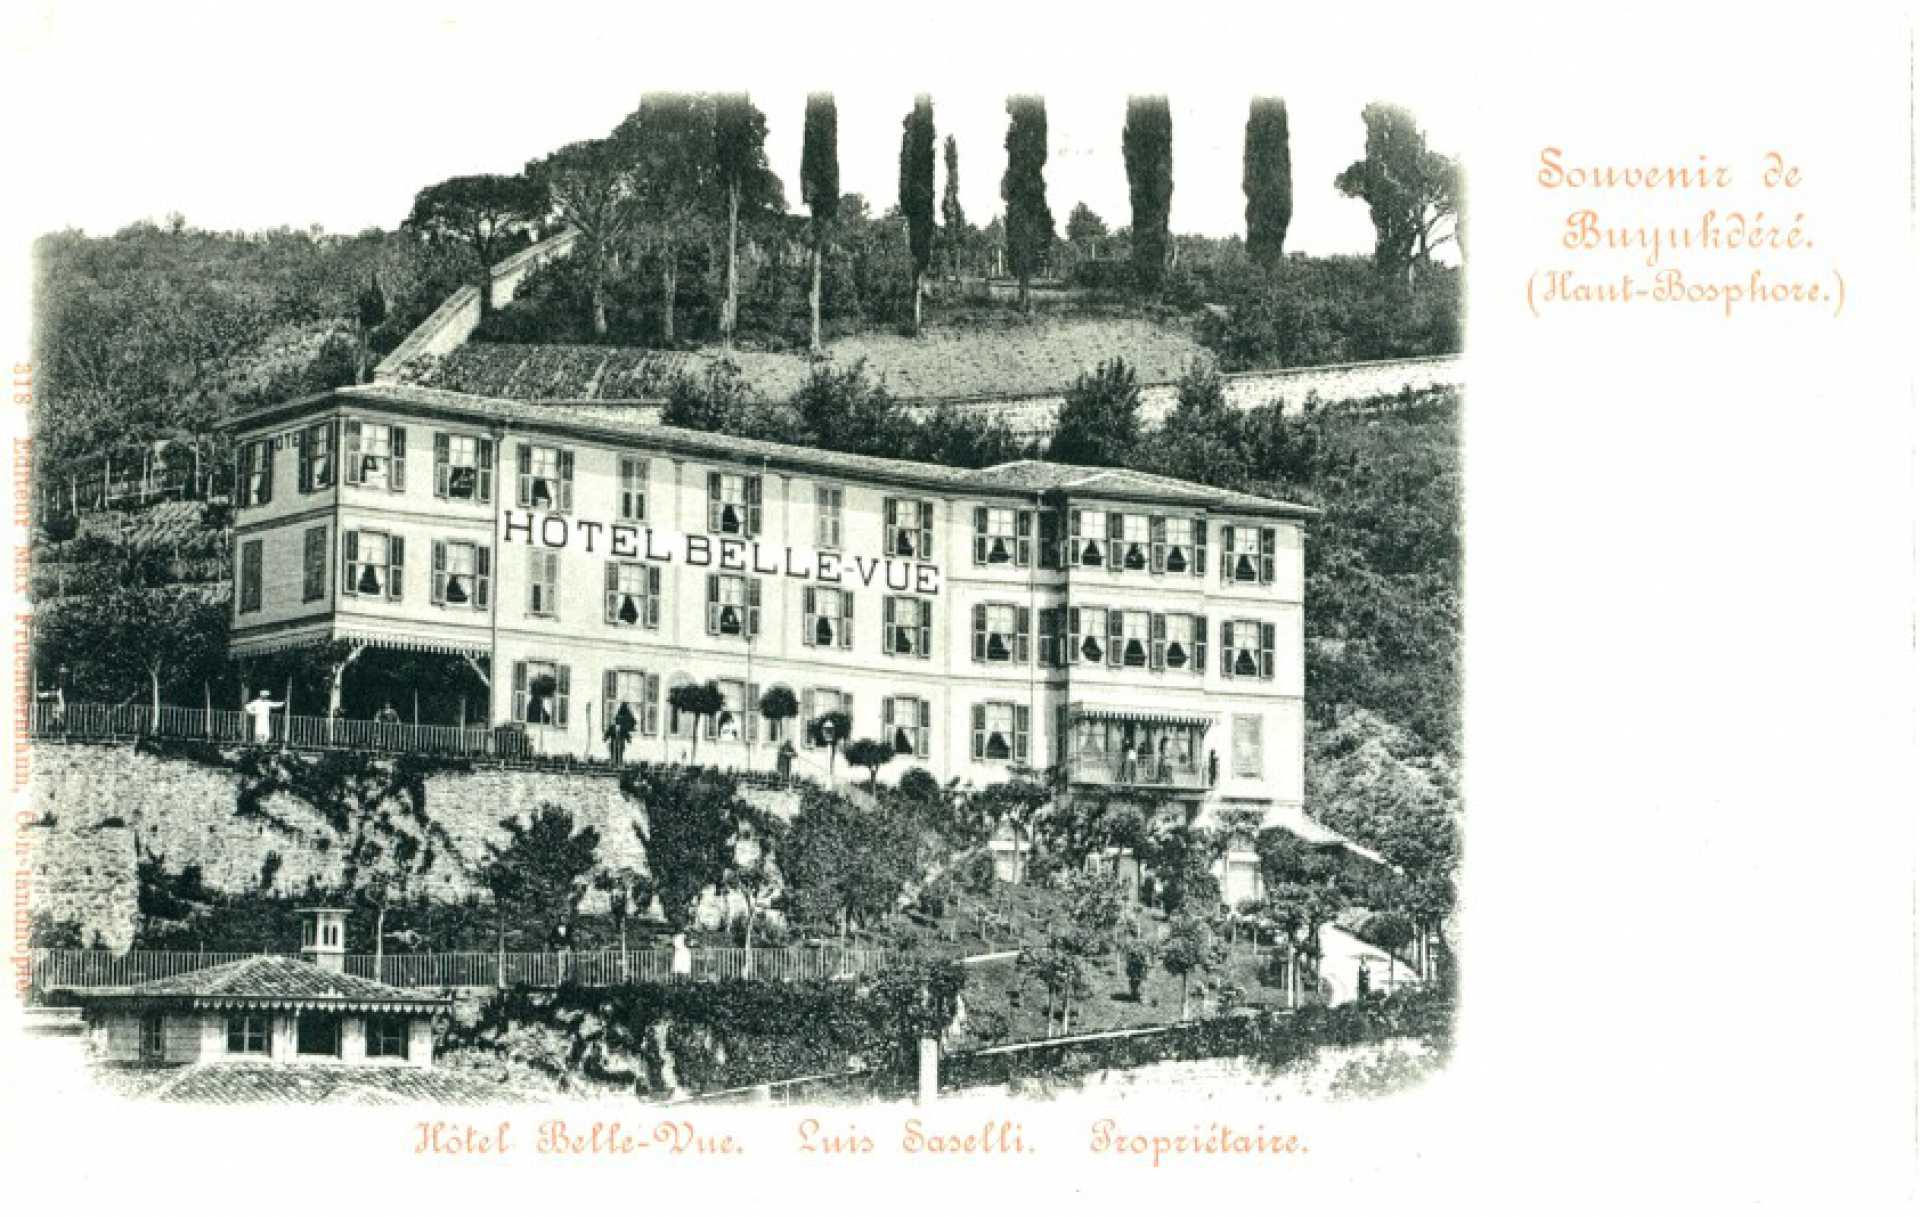 Souvenir de Buyukdere (Hant-Bosphore). Hotel Belle-Vue. Luis Saselli. Proprieteire